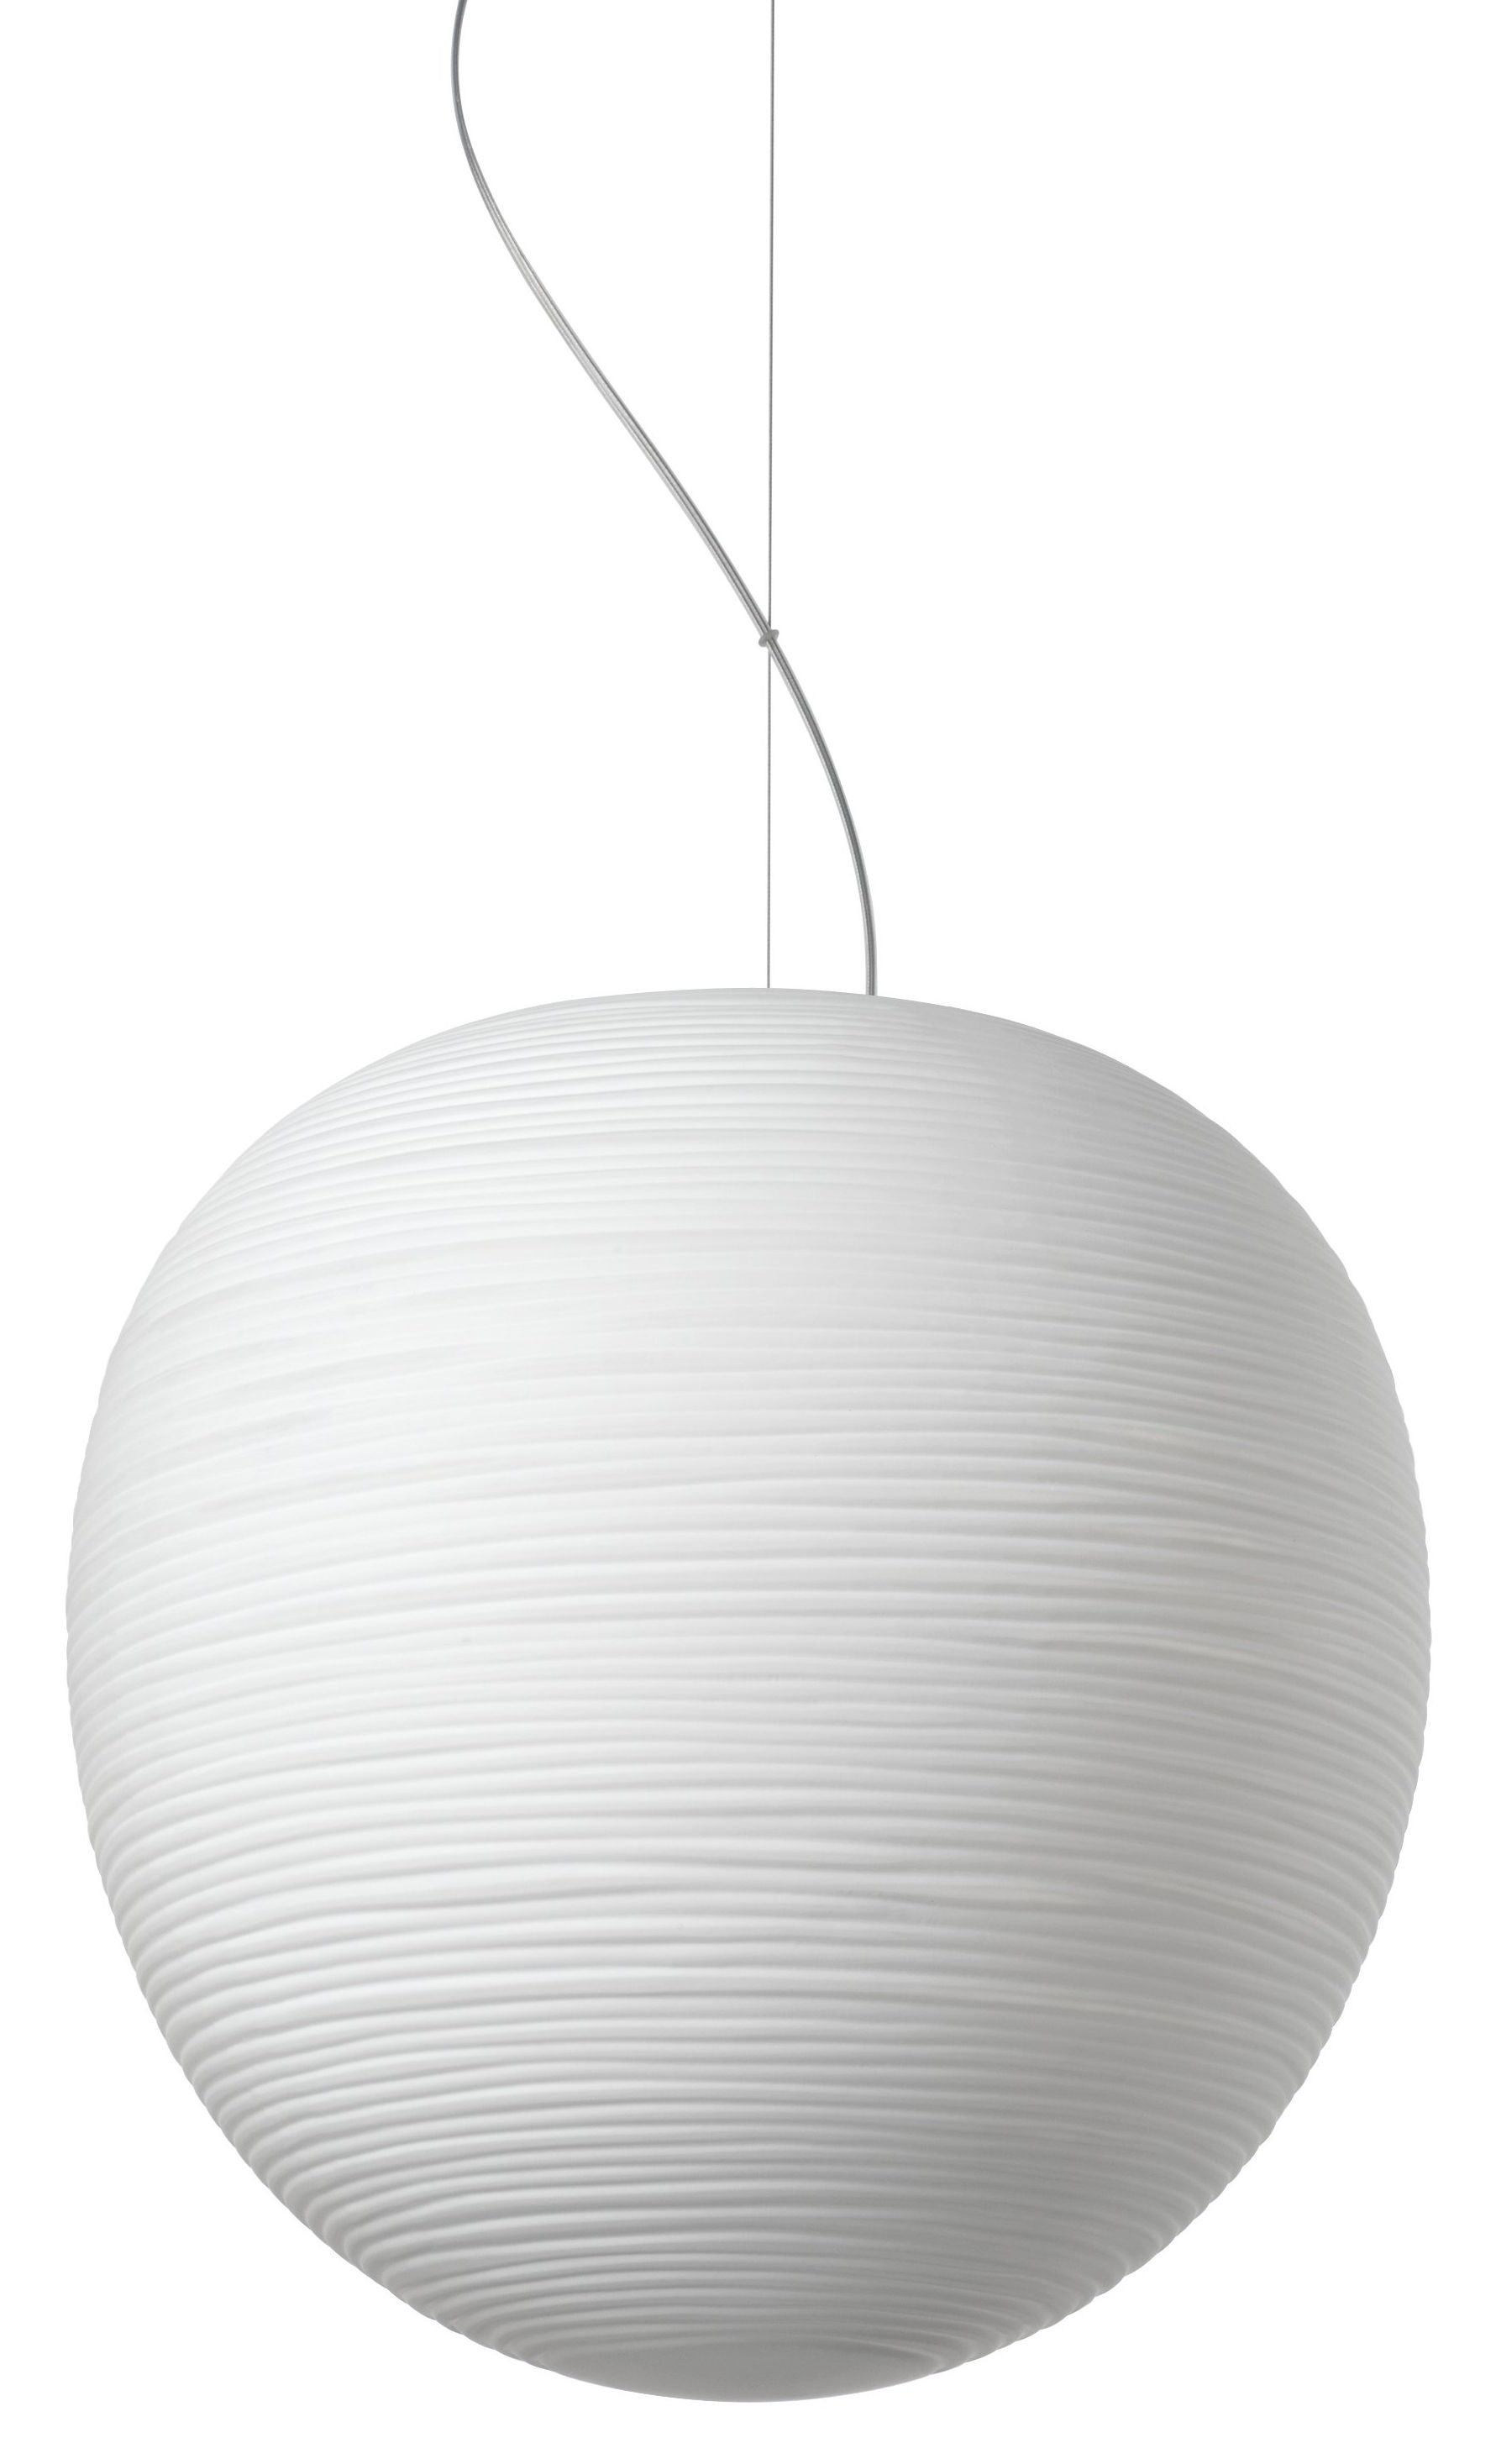 Illuminazione - Lampadari - Sospensione Rituals XL - / Ø 40 x H 41 cm di Foscarini - Bianco / Ø 40 x H 41 cm - Vetro soffiato a bocca